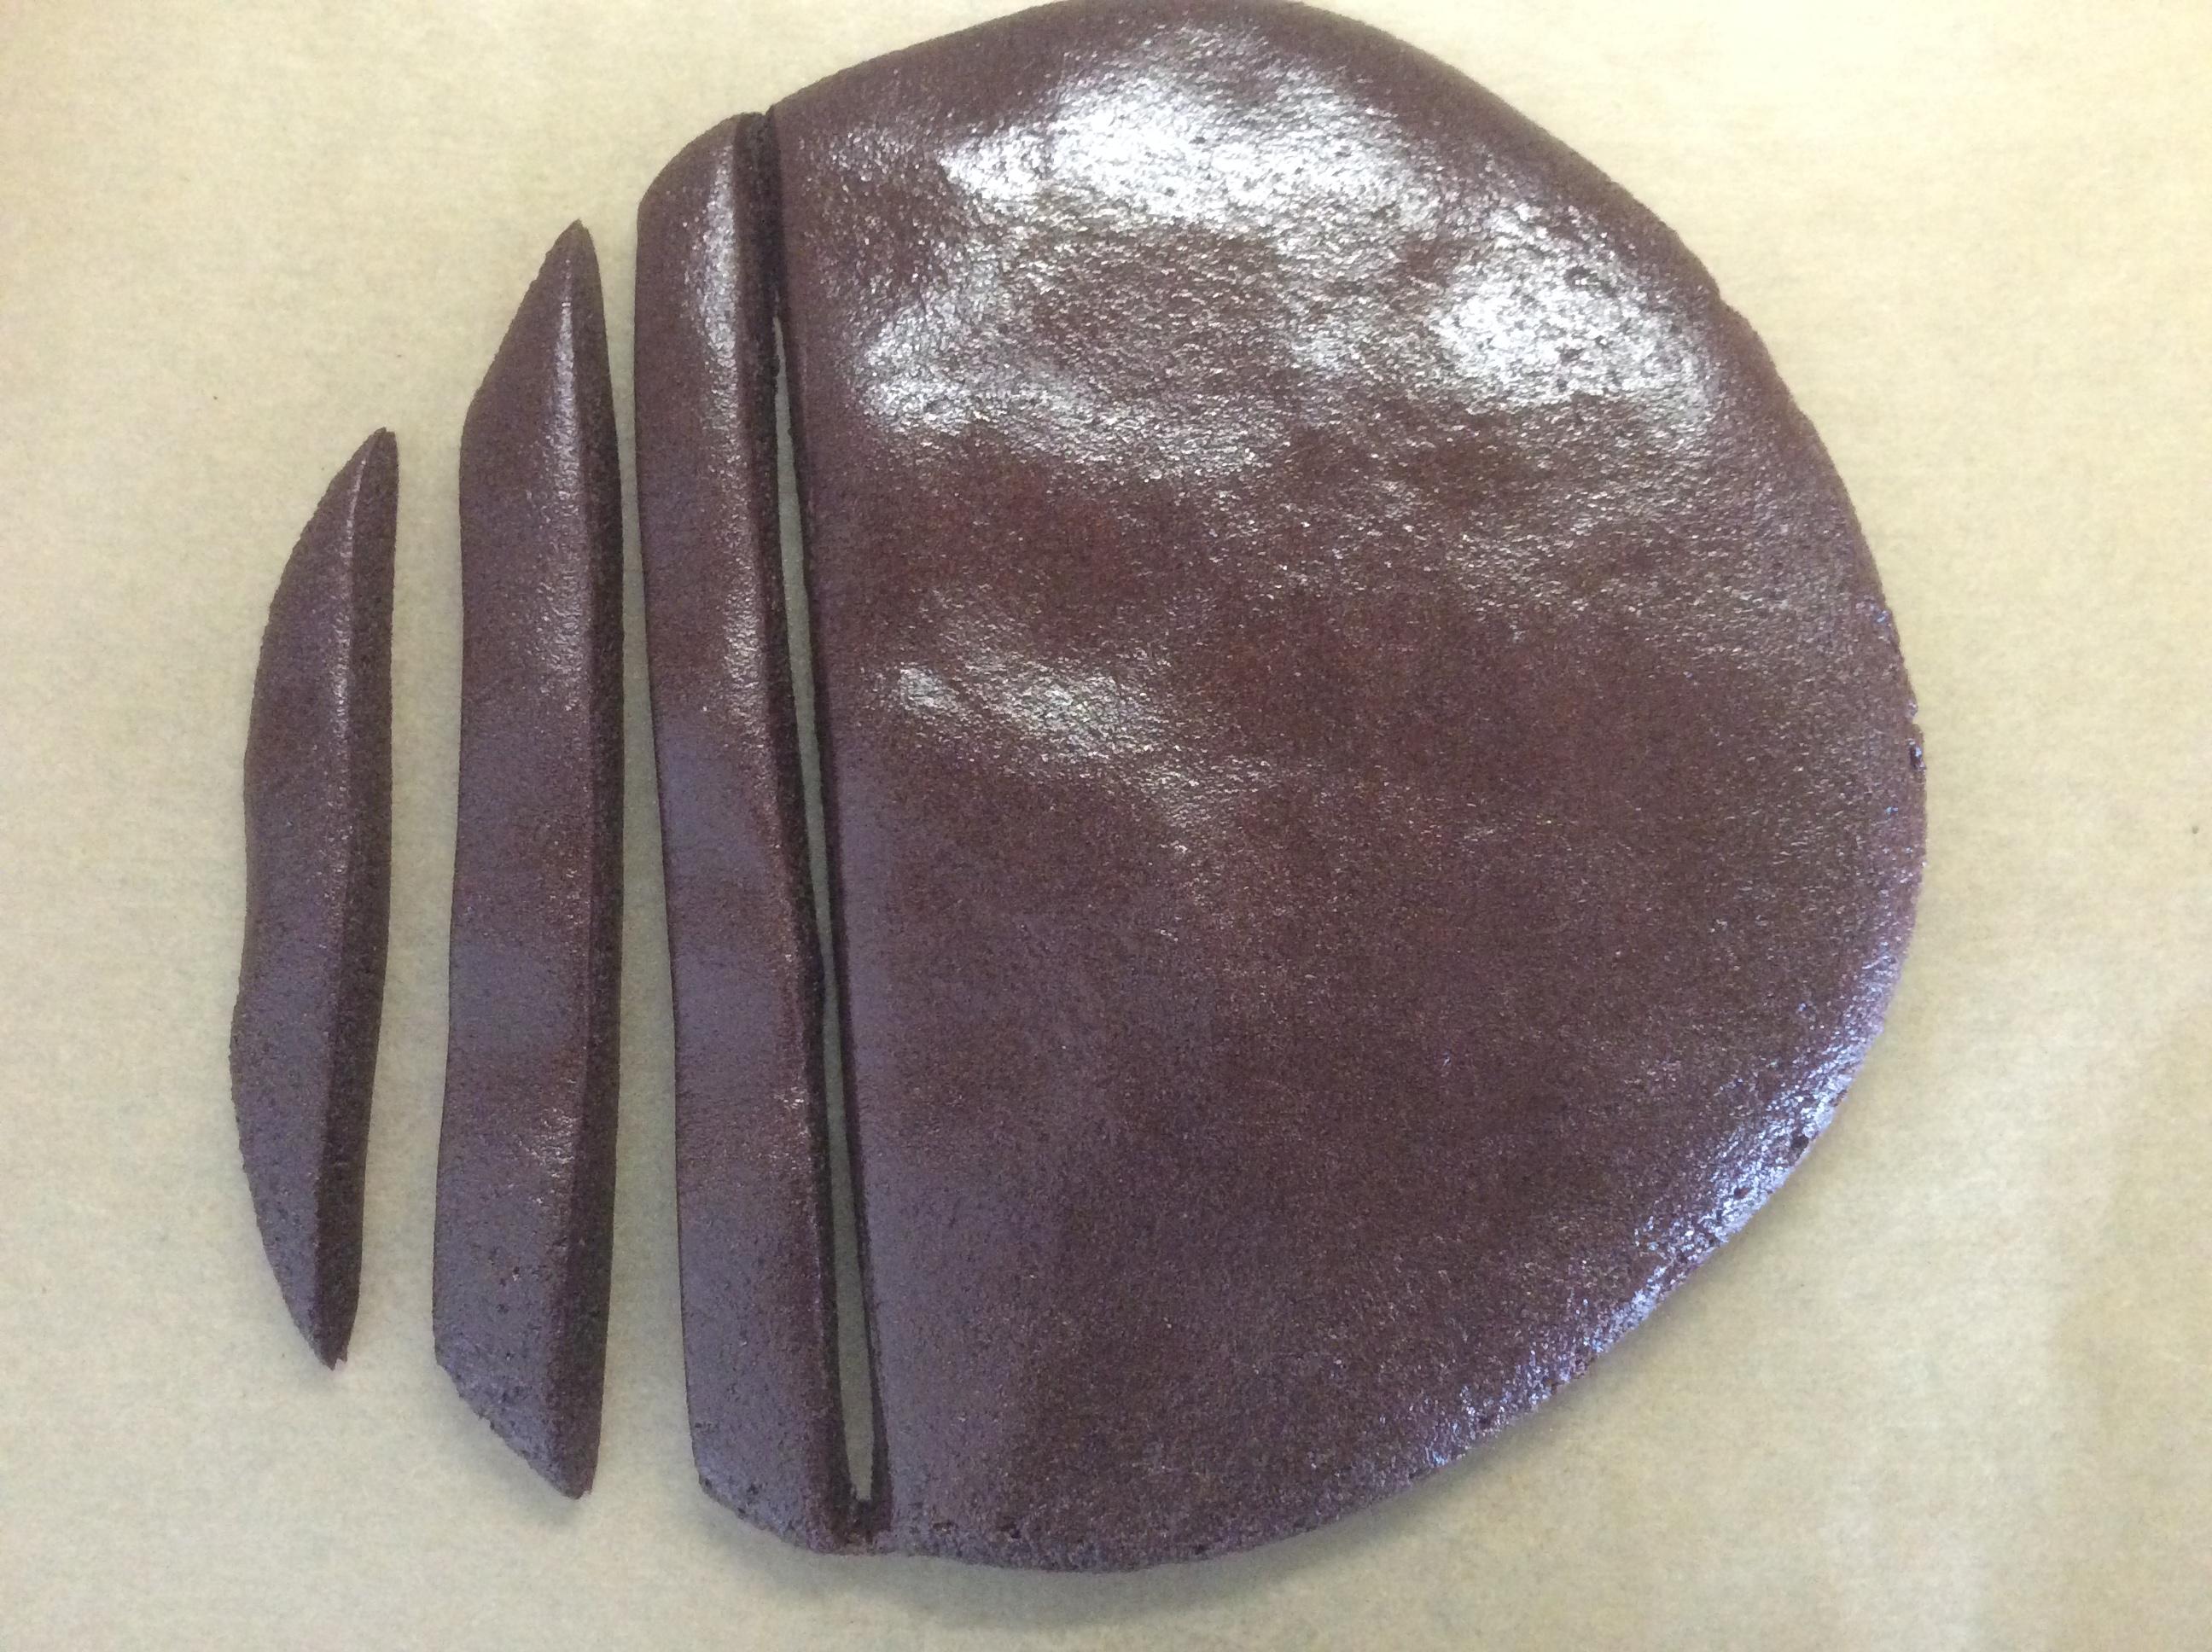 Küchenkränzchen Tootsie Rolls I Schokoladen Karamell